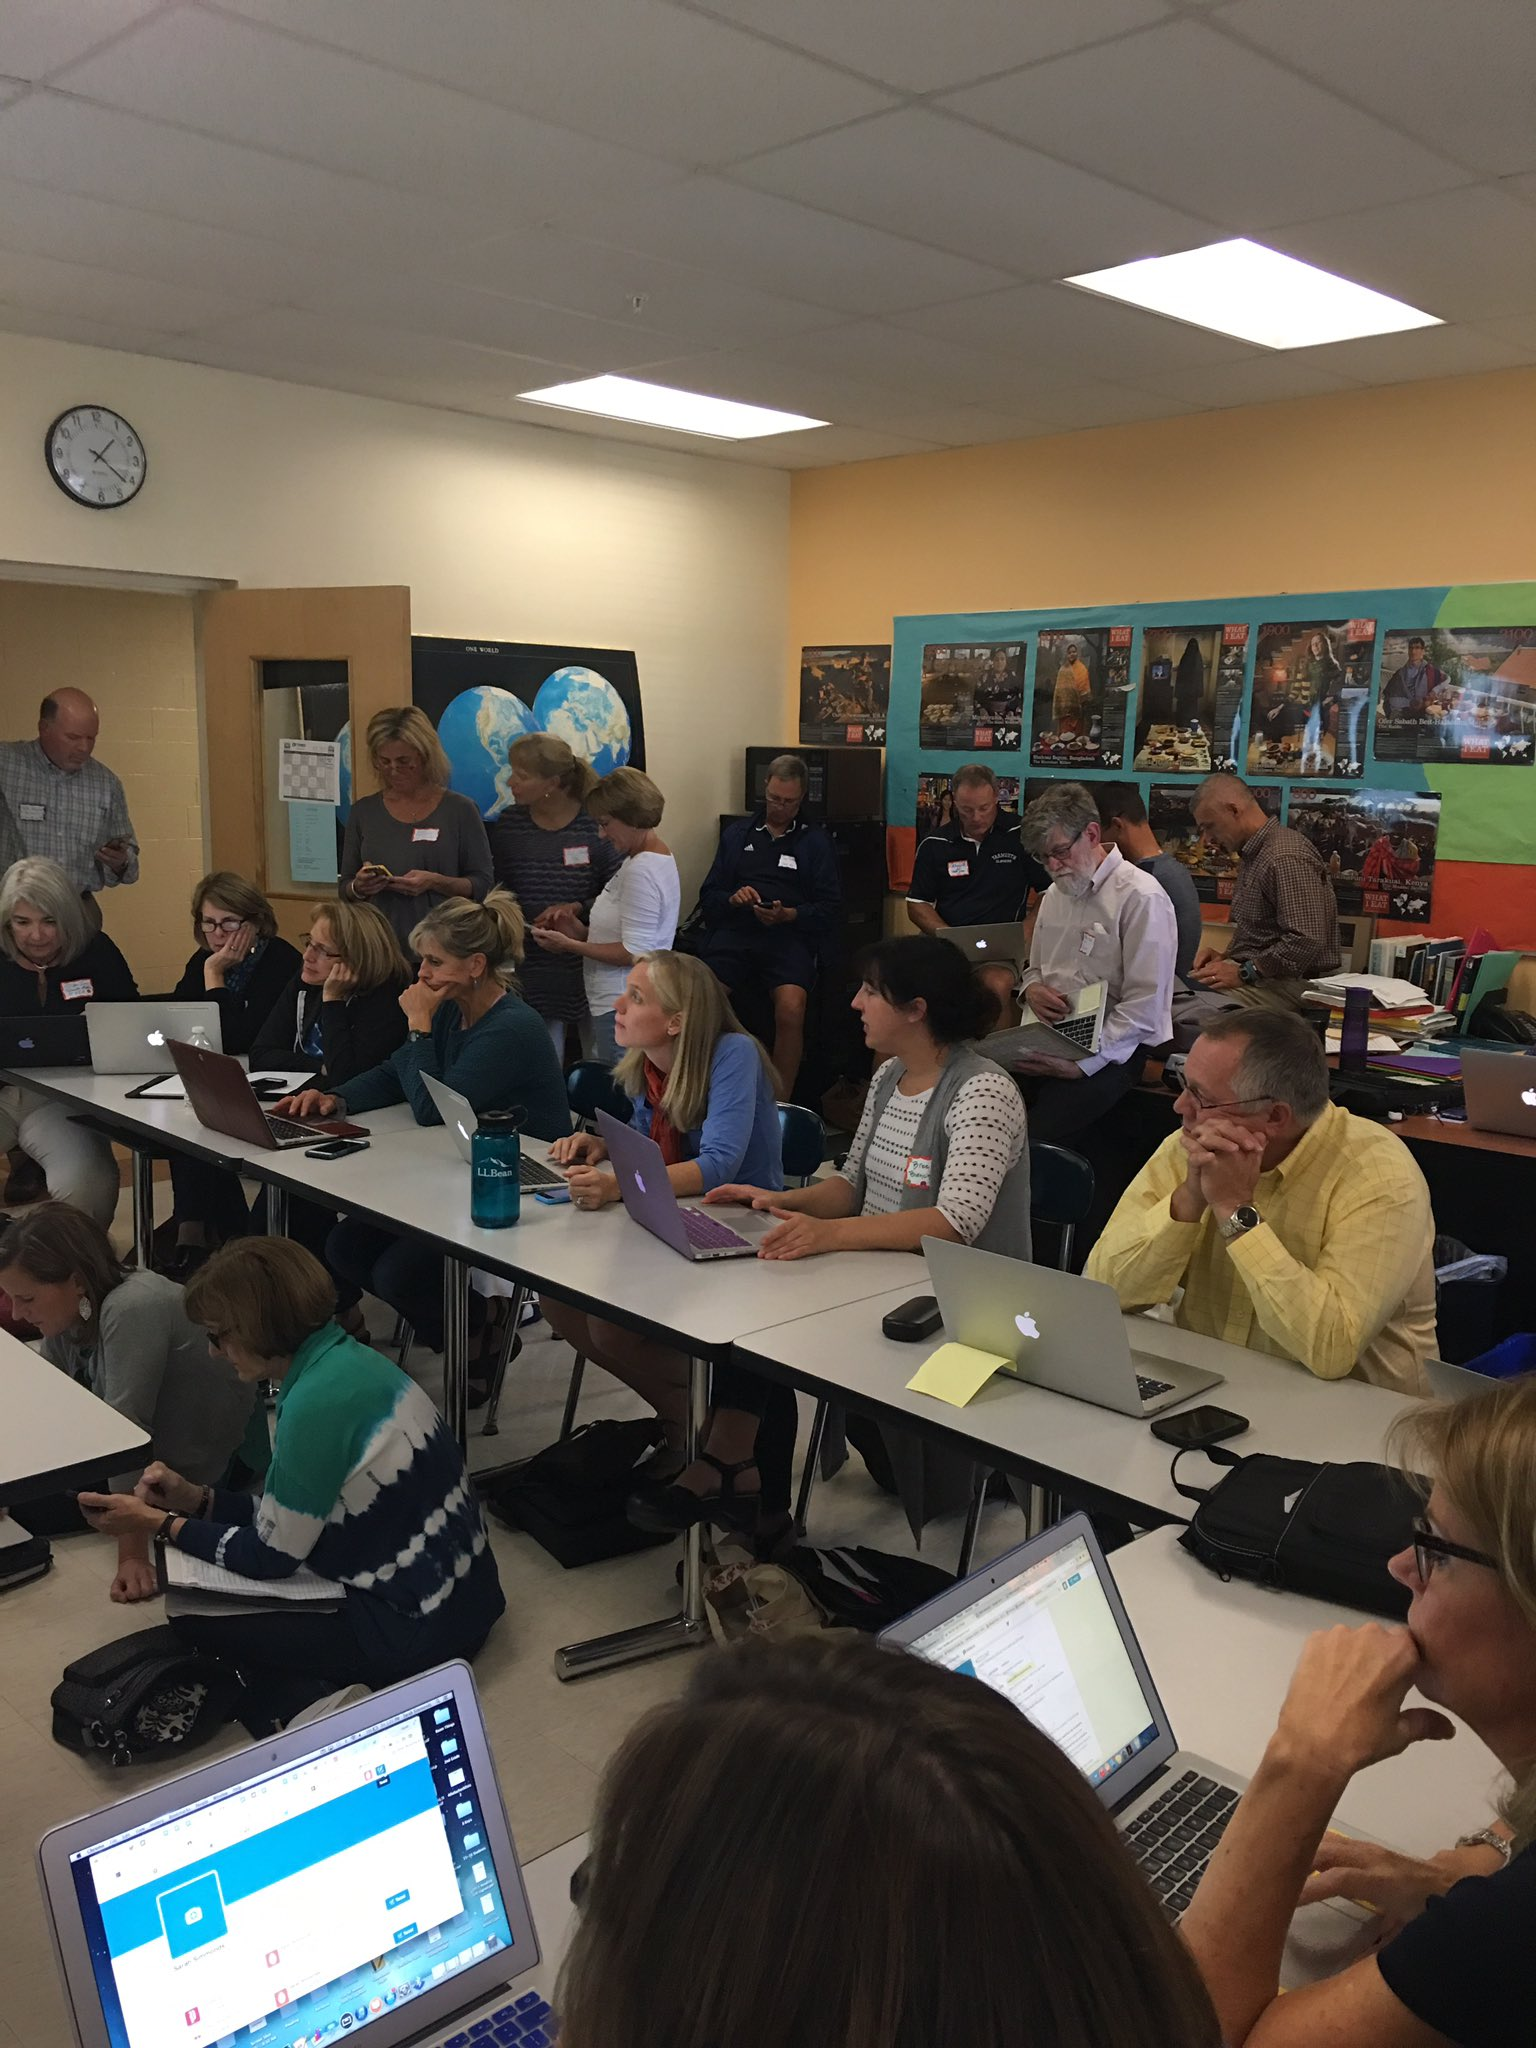 Lots of educators sending their first tweets! #yfinnovate https://t.co/tmDJ4SWo9V